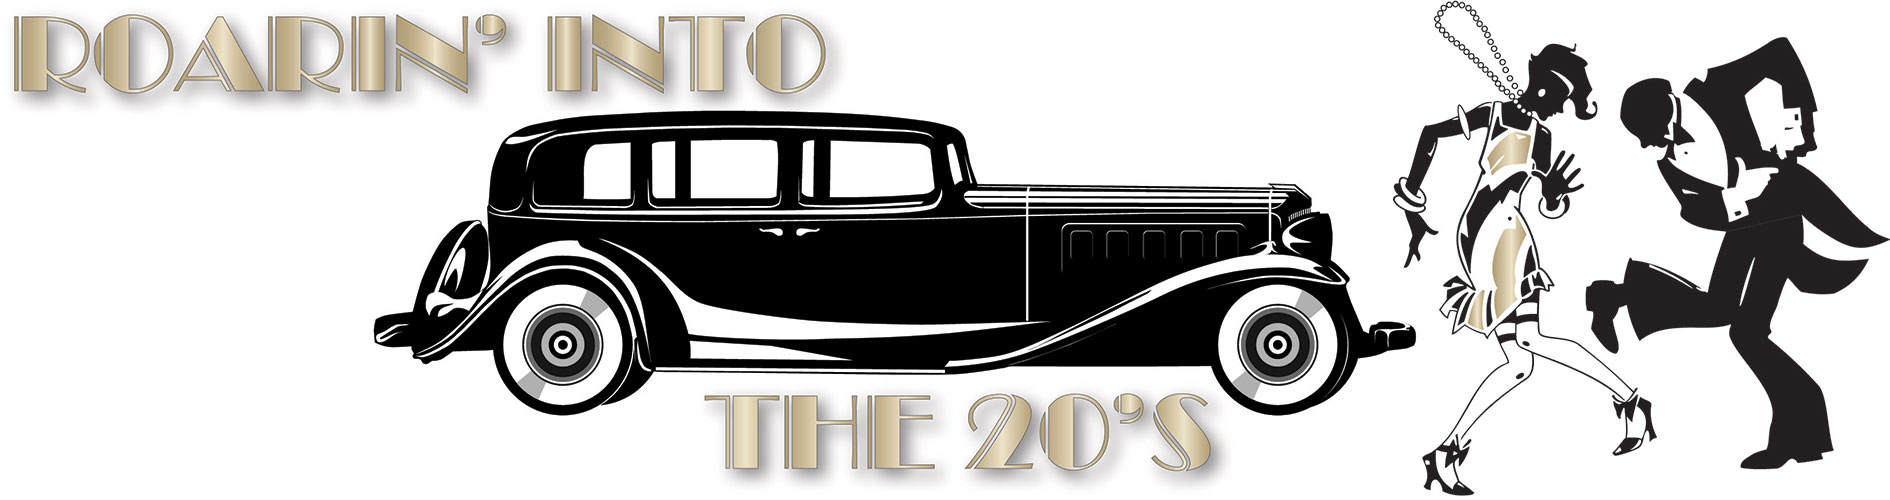 Auction-Logo-2012-Gold_web.jpg